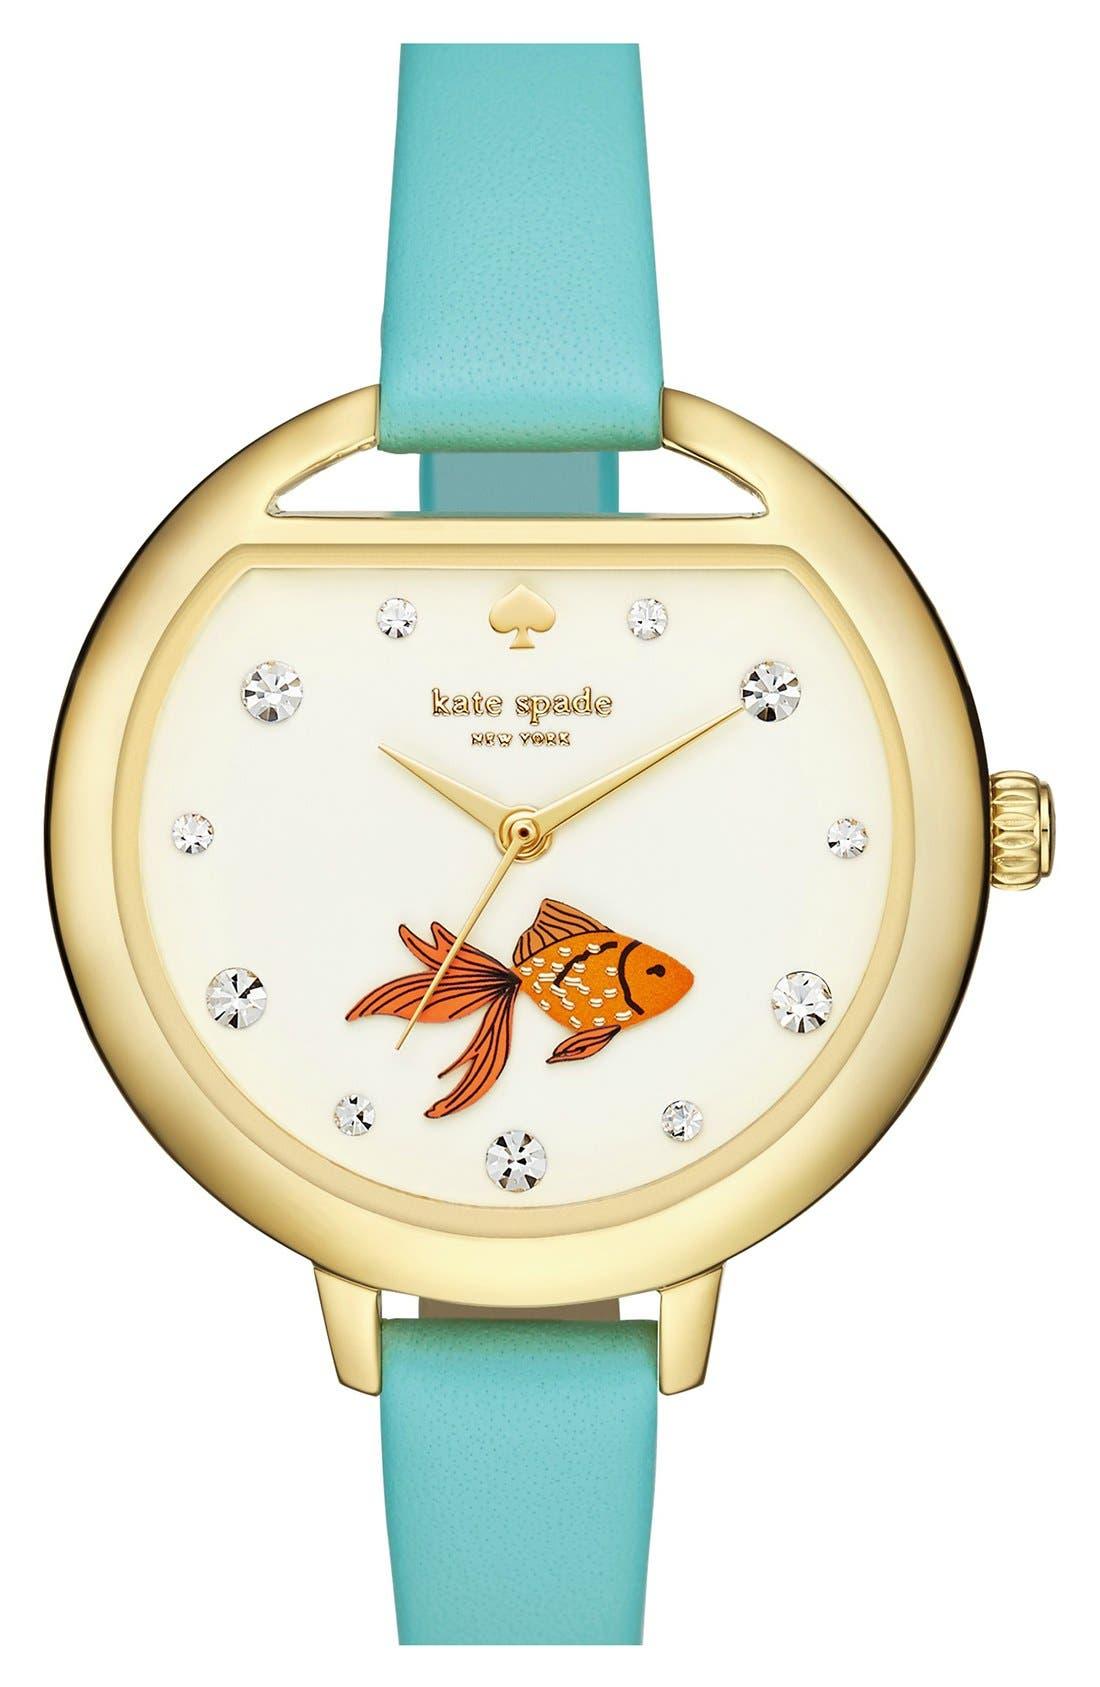 Alternate Image 1 Selected - kate spade new york 'metro - fishbowl' leather strap watch, 34mm